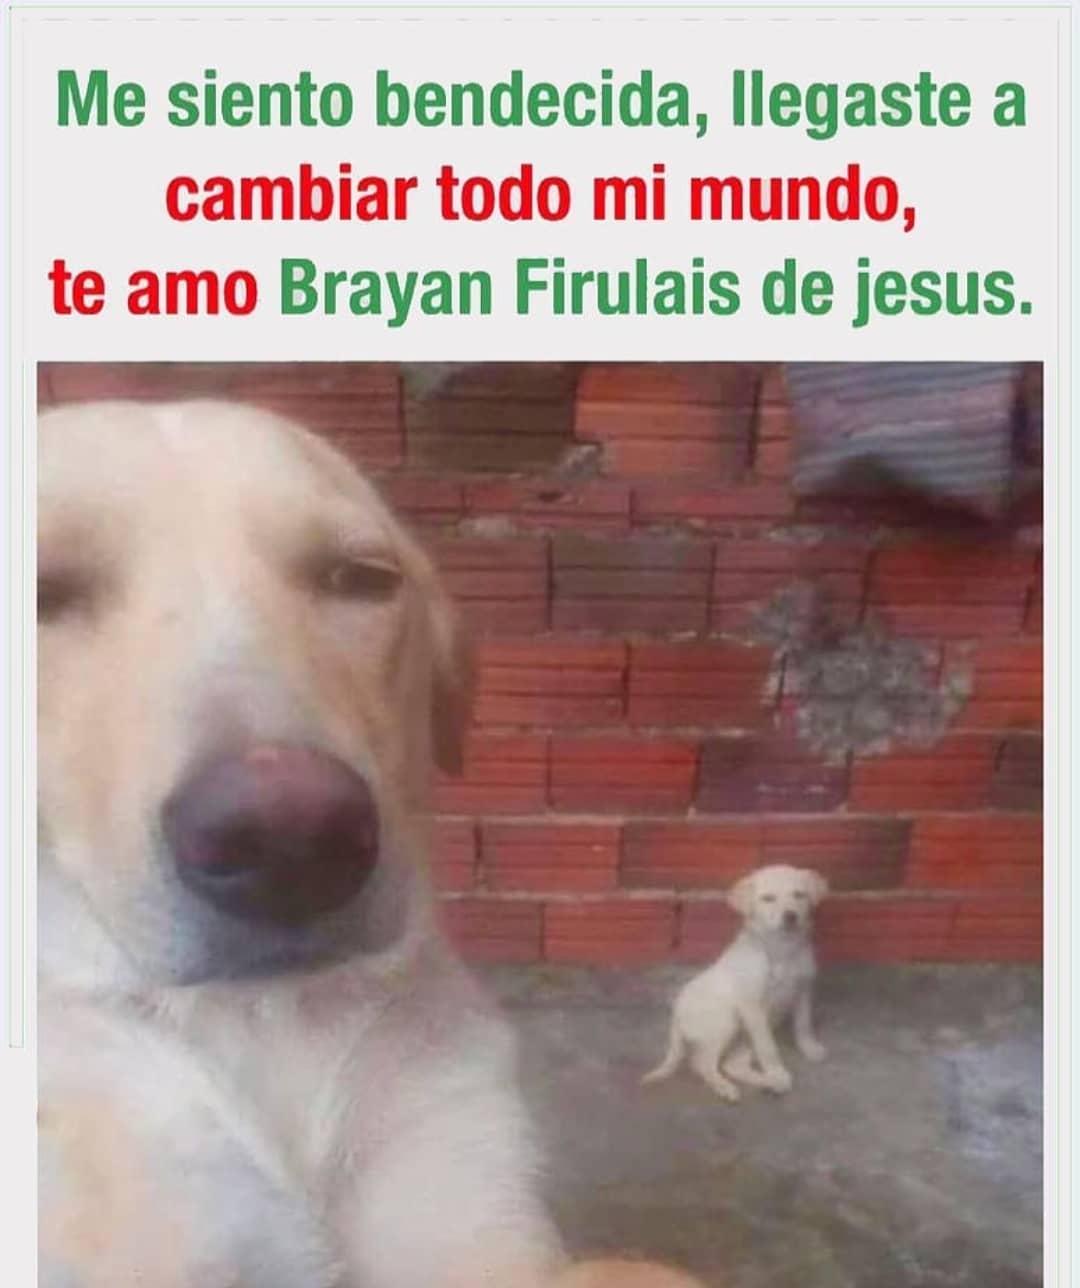 Me siento bendecida, llegaste a cambiar todo mi mundo, te amo Brayan Firulais de Jesus.